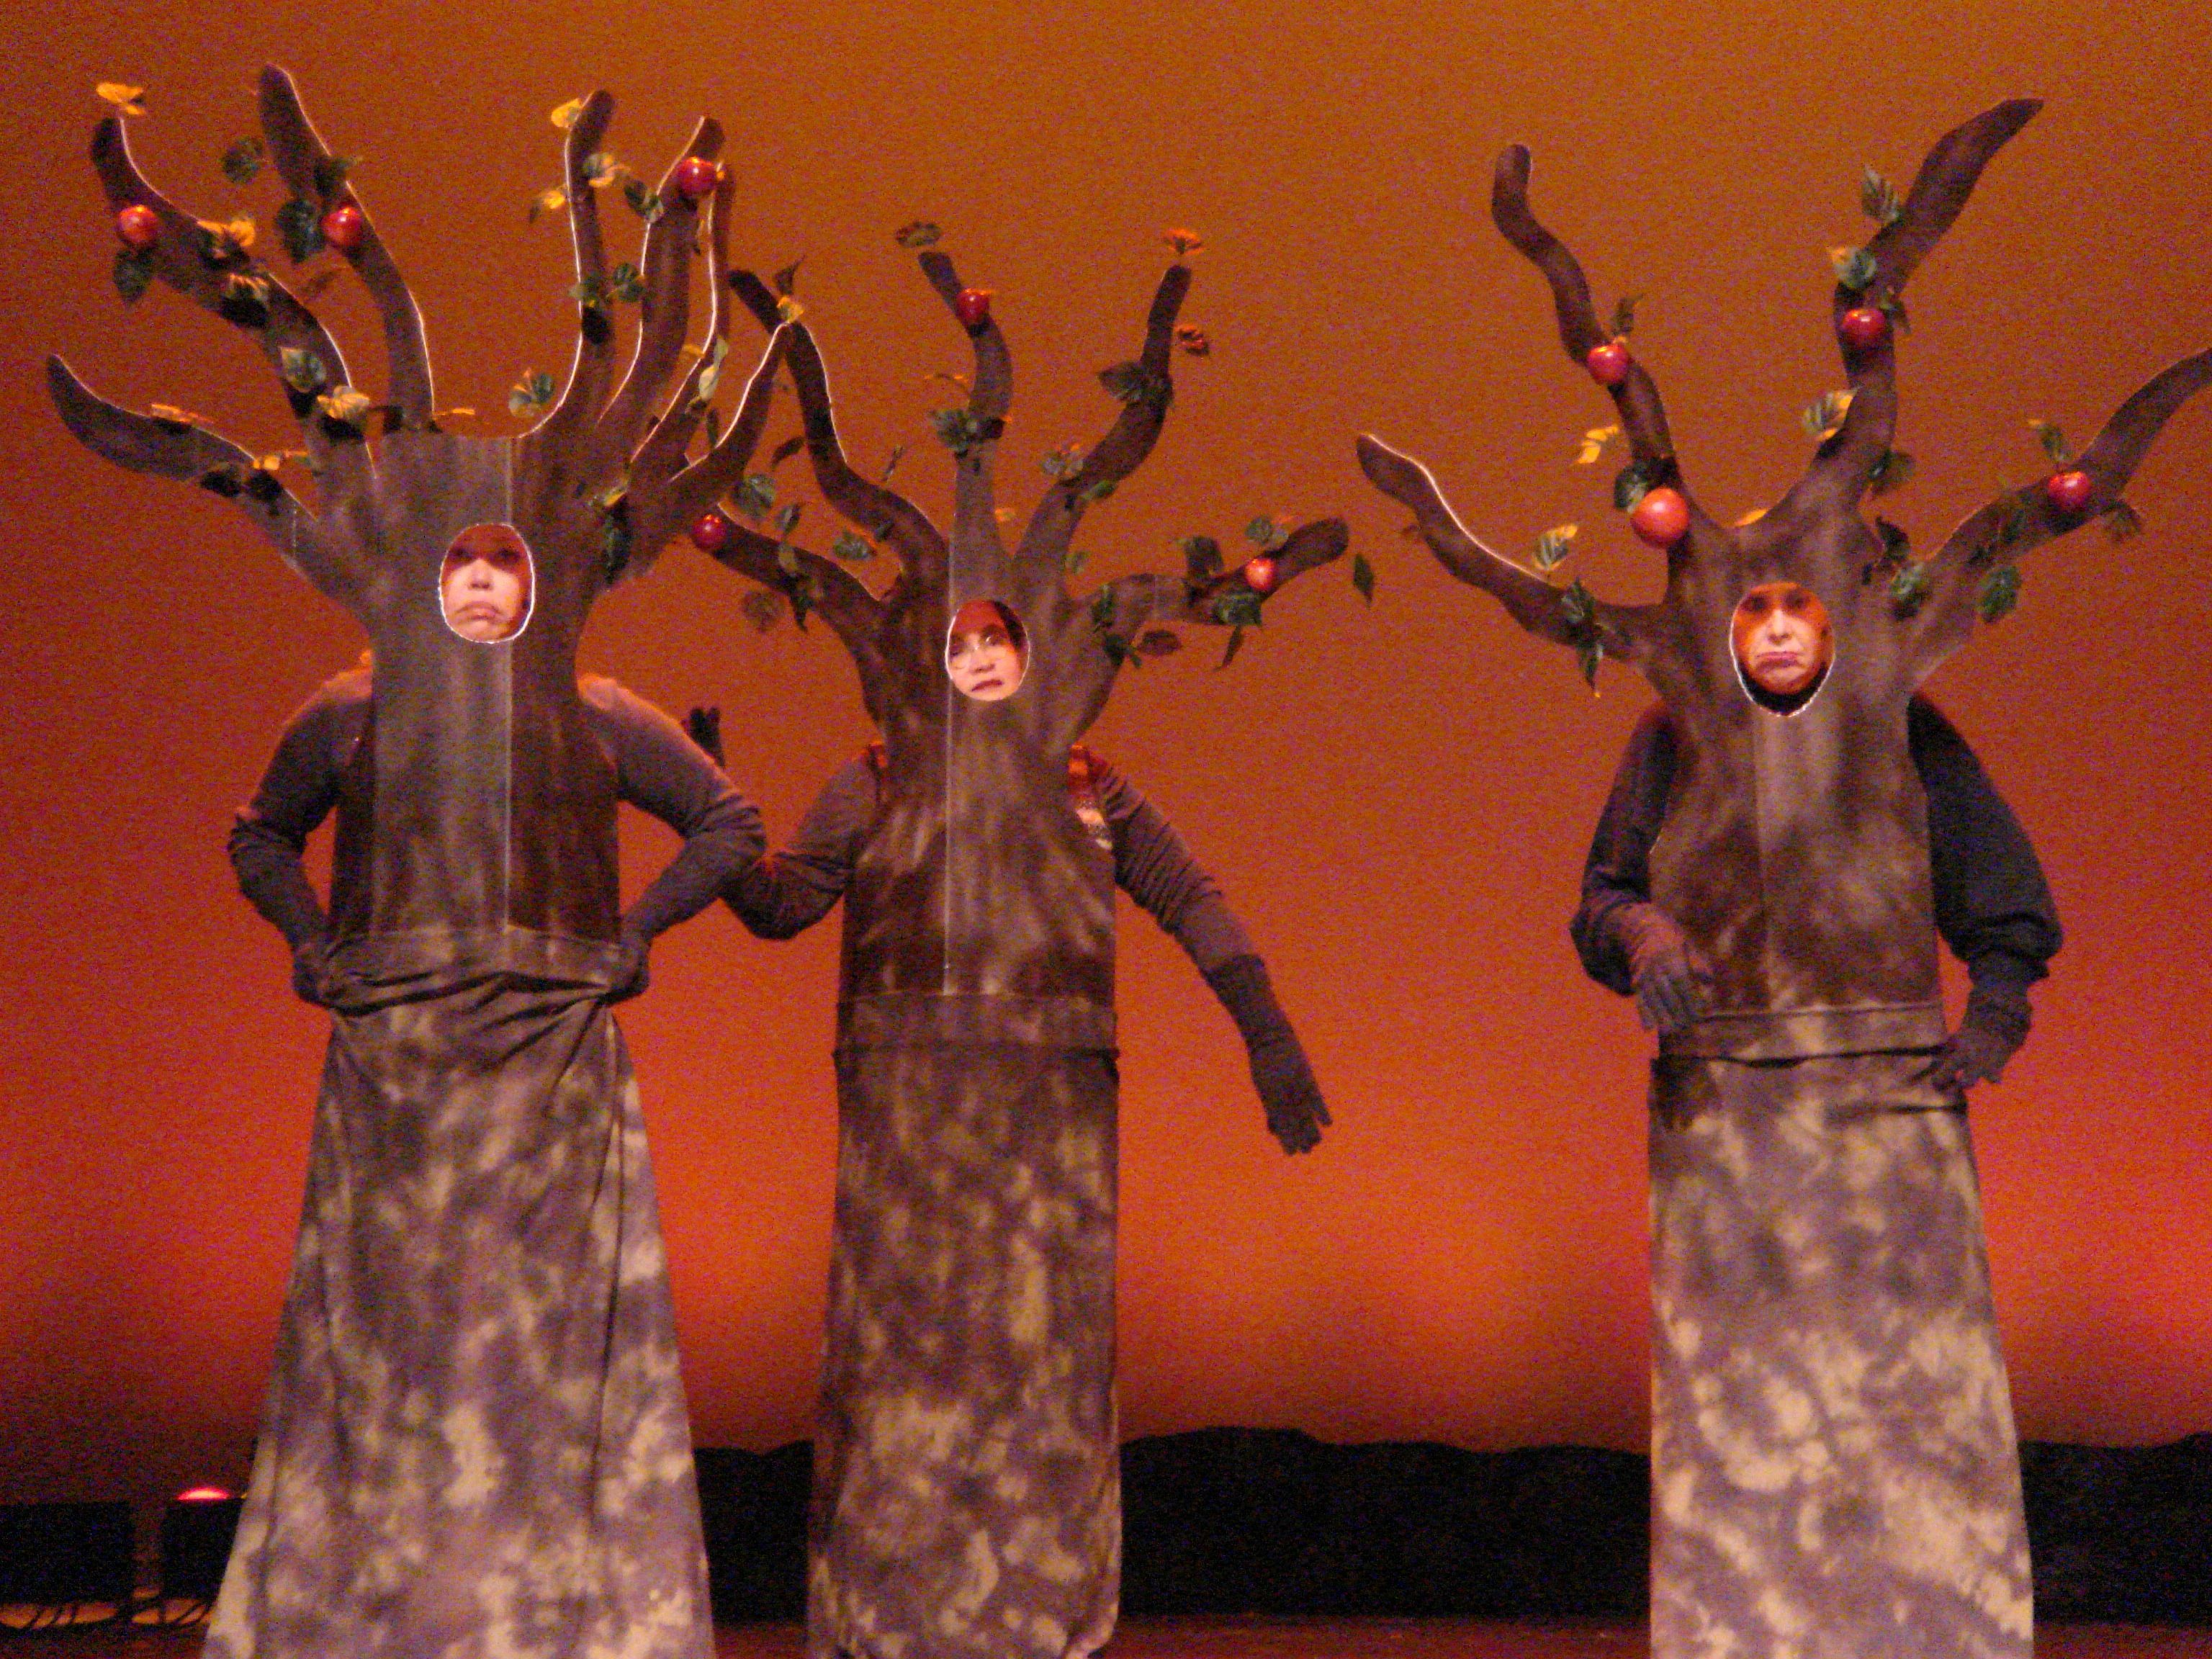 Wizard Of Oz - Apple Trees. Costume